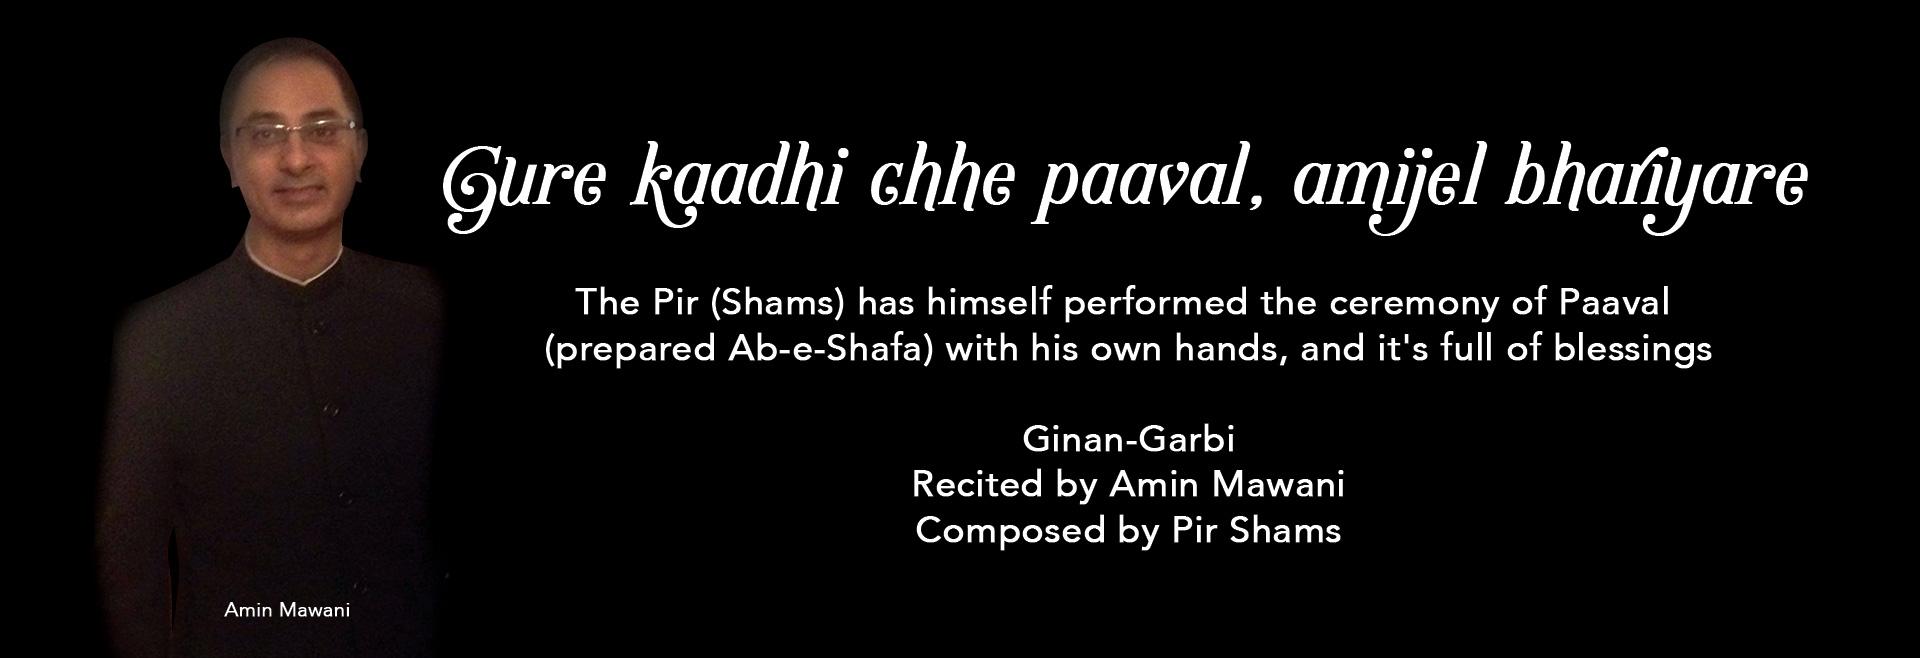 Amin Mawani Gure Kaadhi